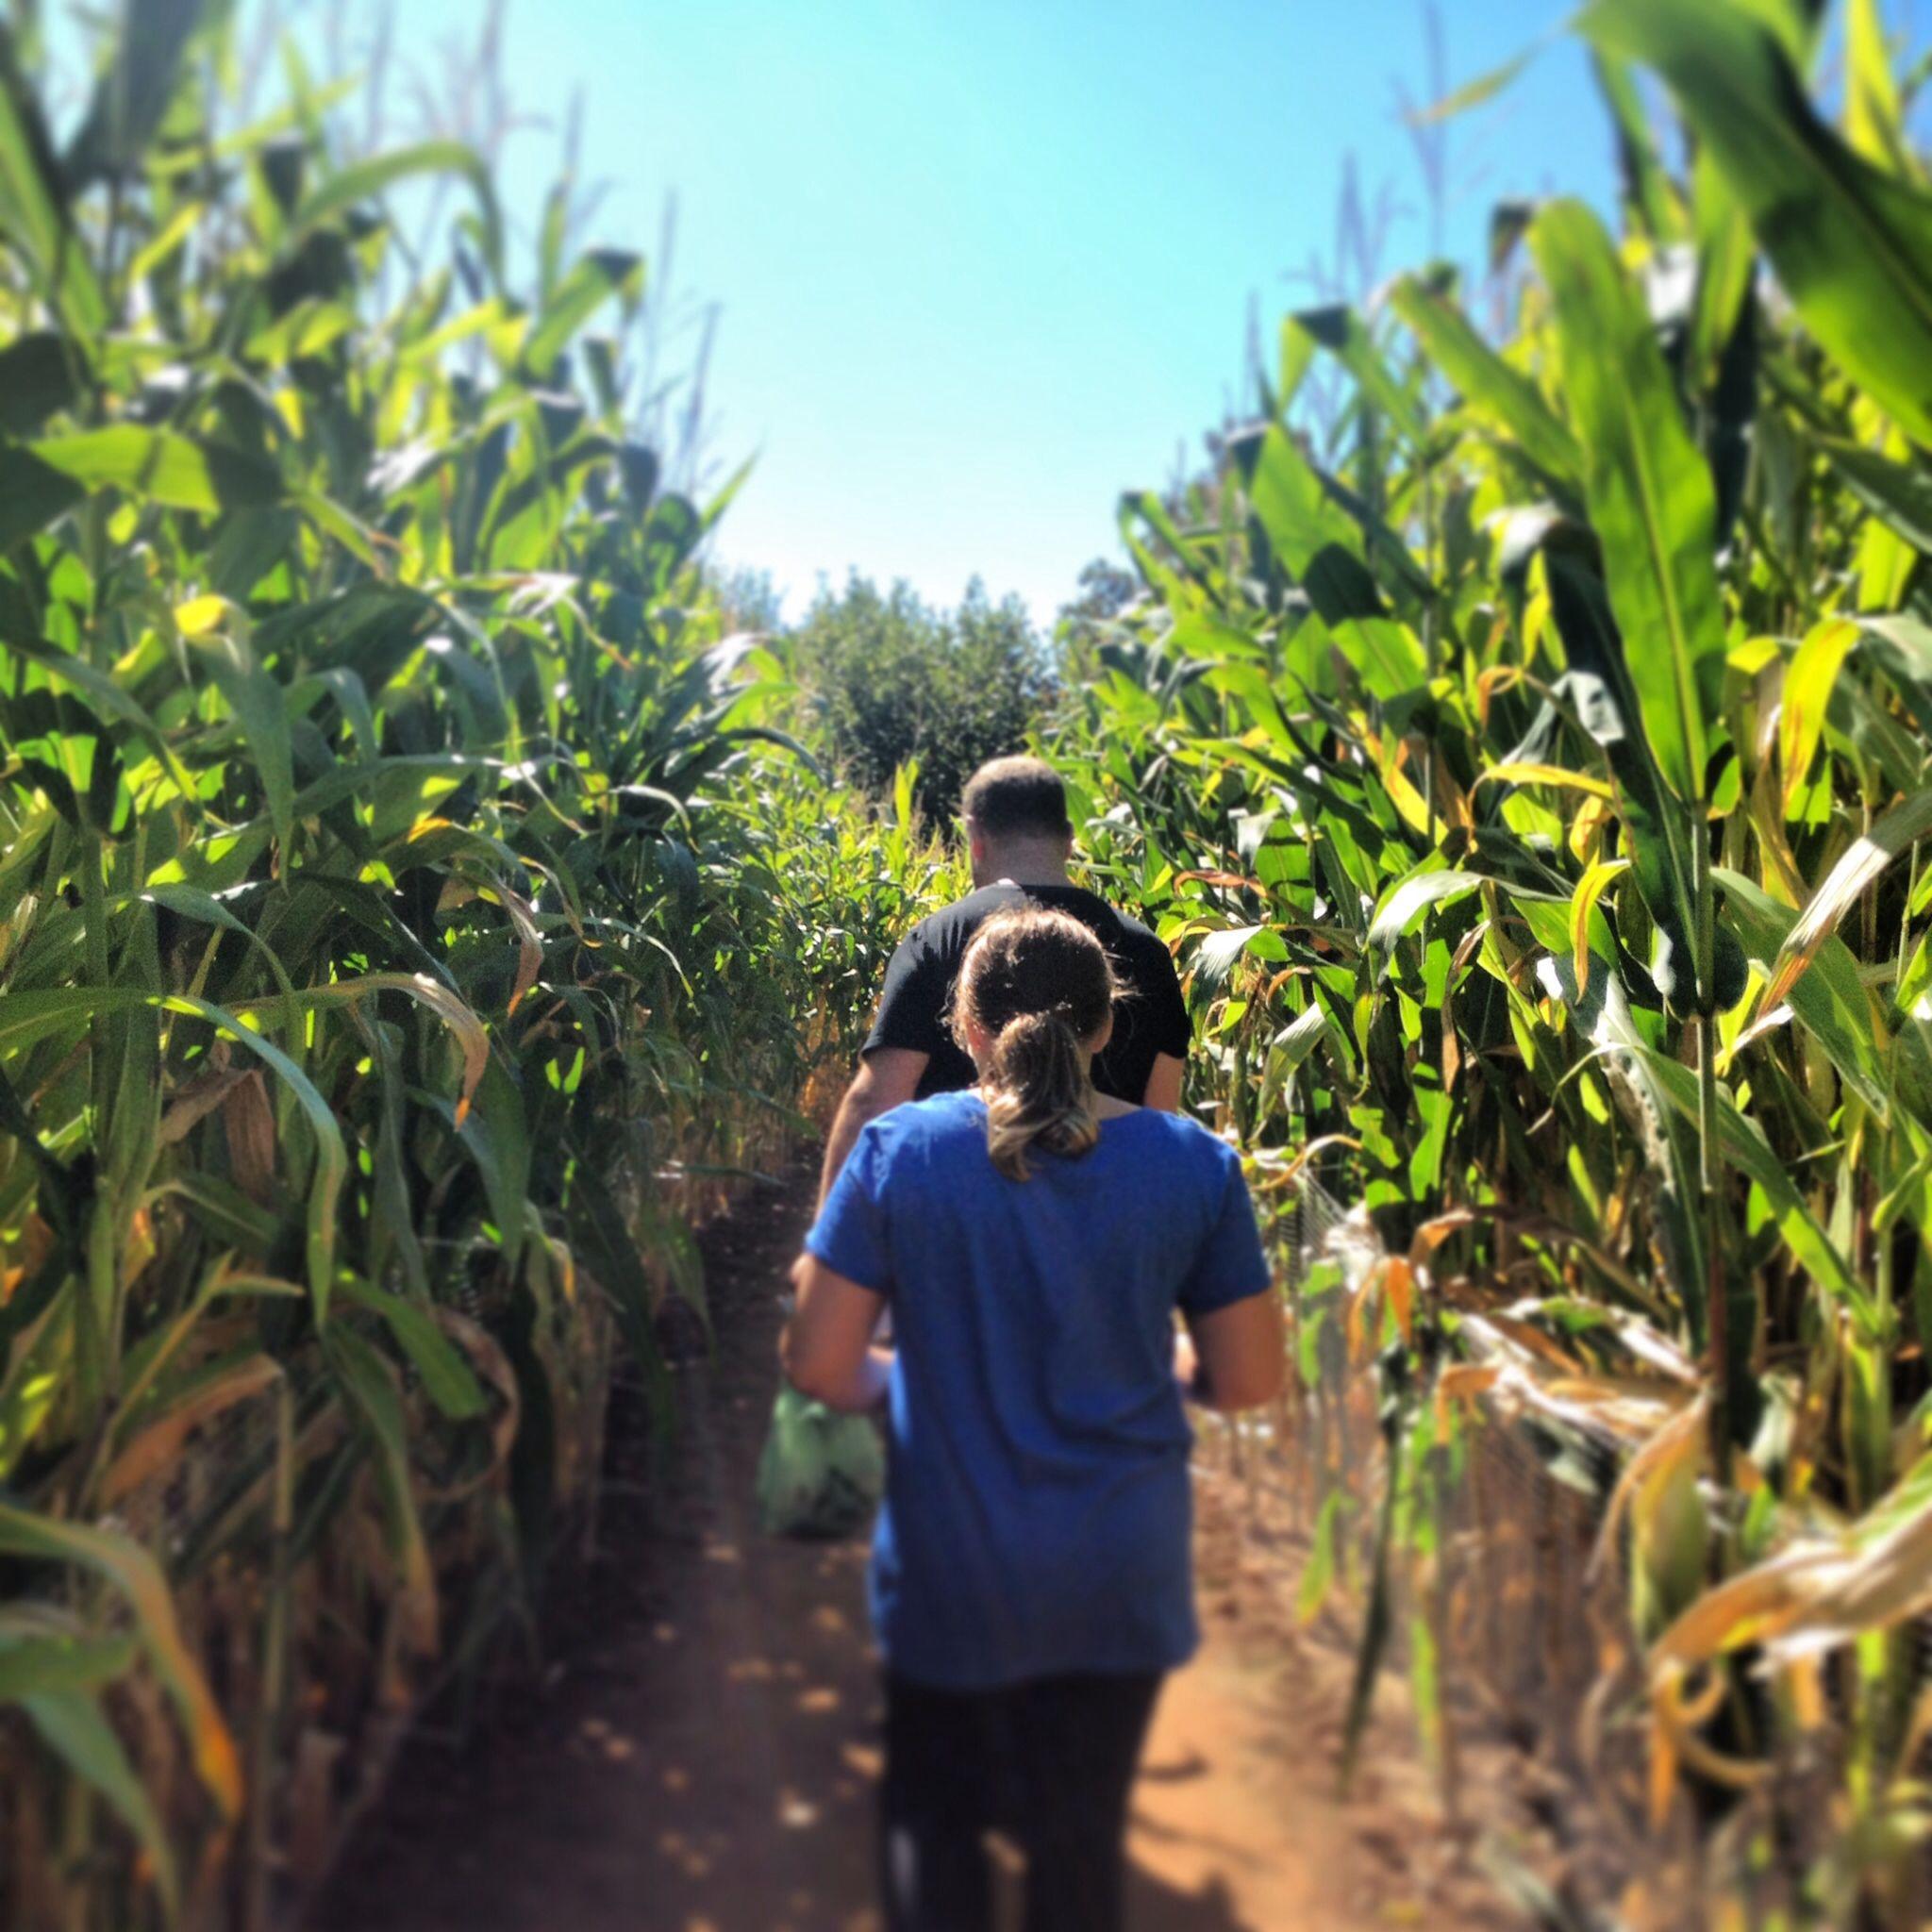 Corn Maze Lyman Orchard Middlefield Ct Middlefield Lyman Growing Up